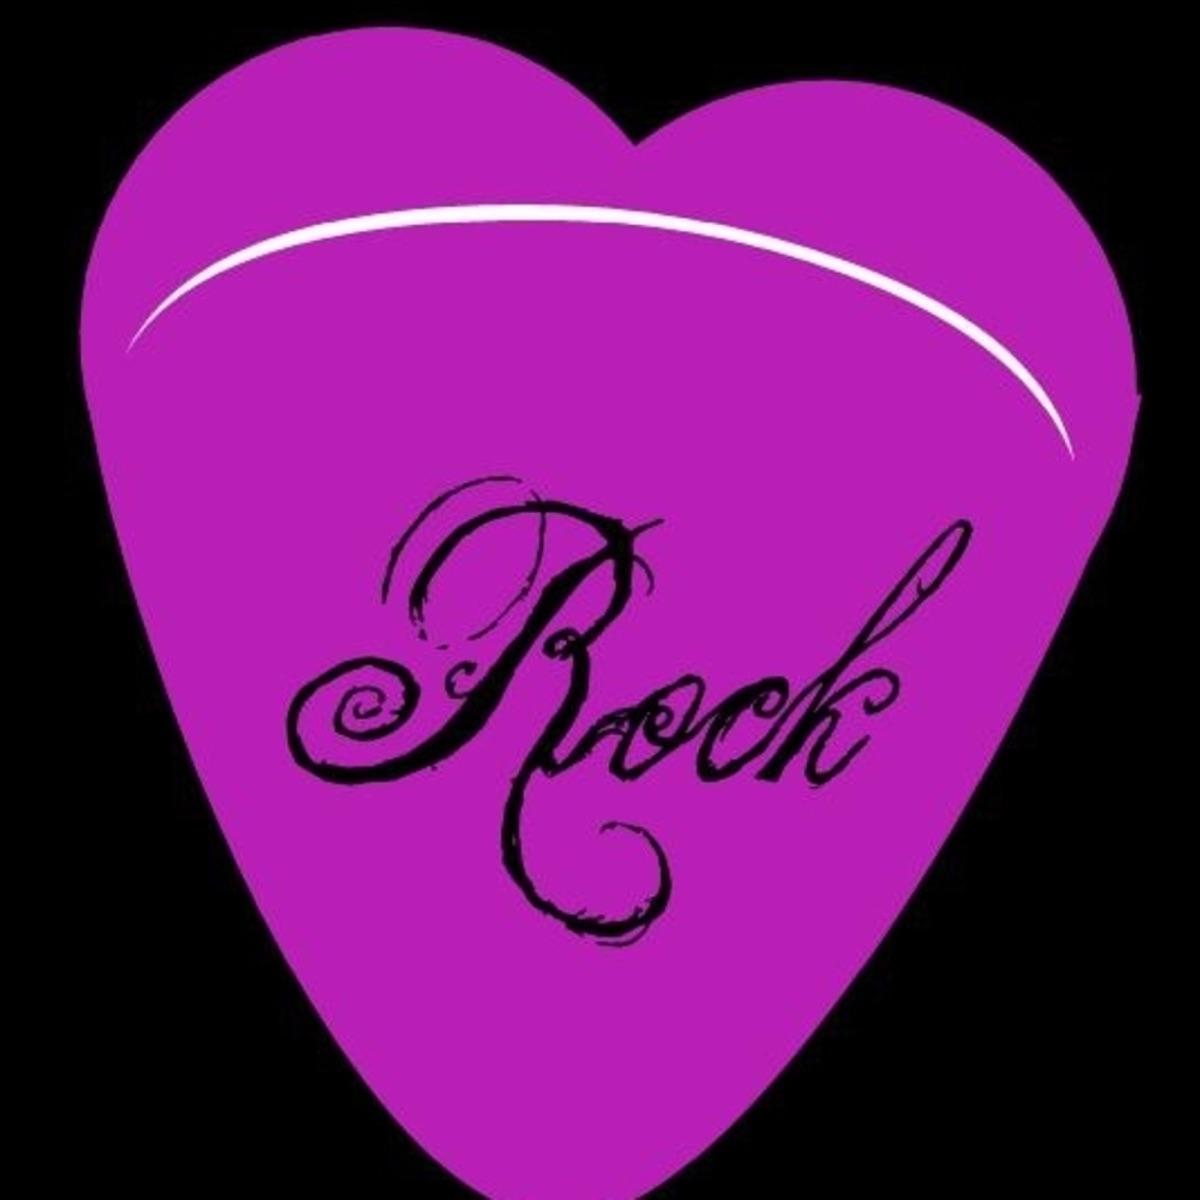 Corazón Púrpura Rock